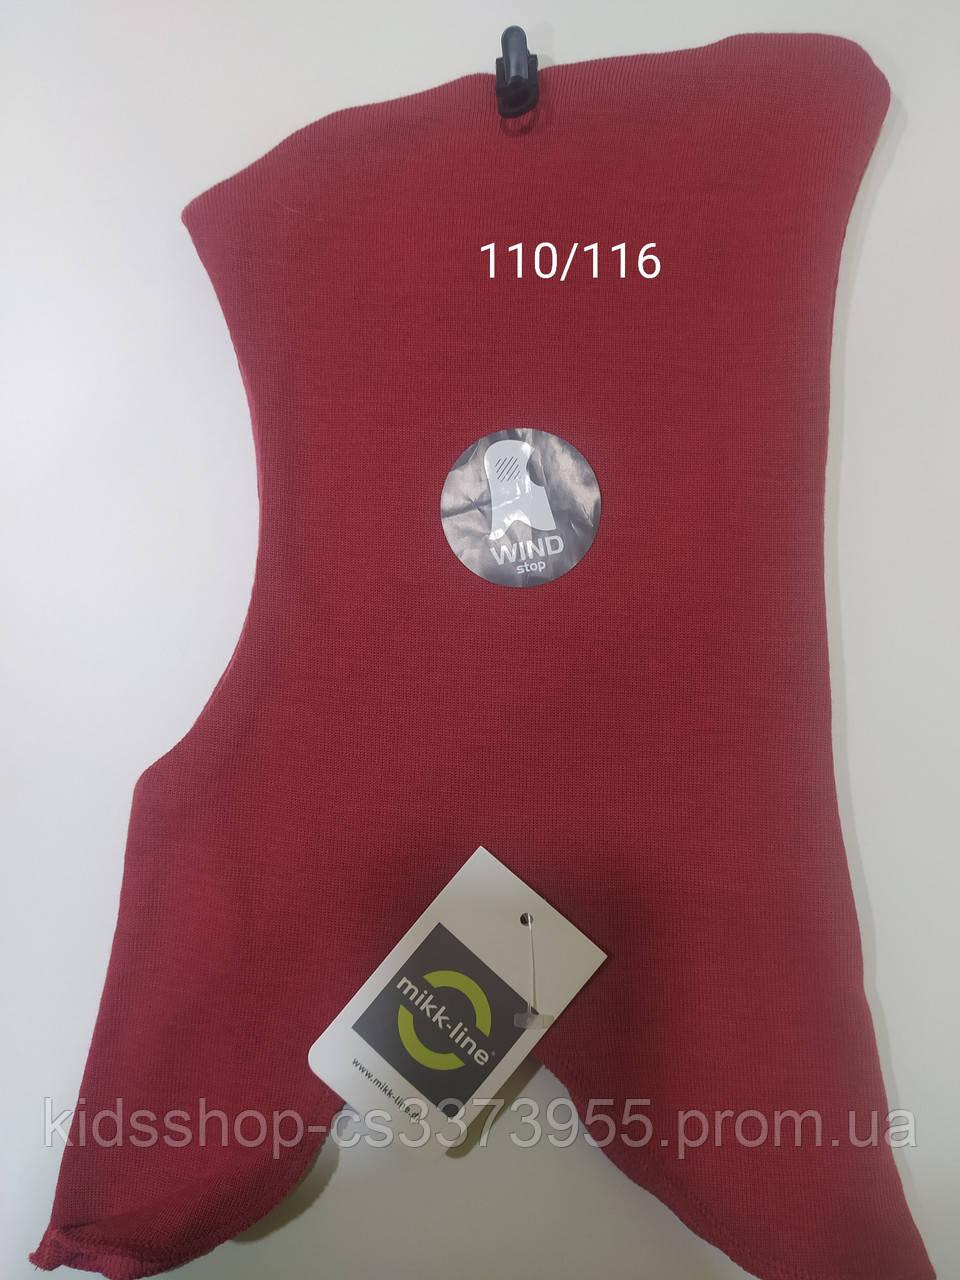 Шапка шлем зимняя детская размер 110/116